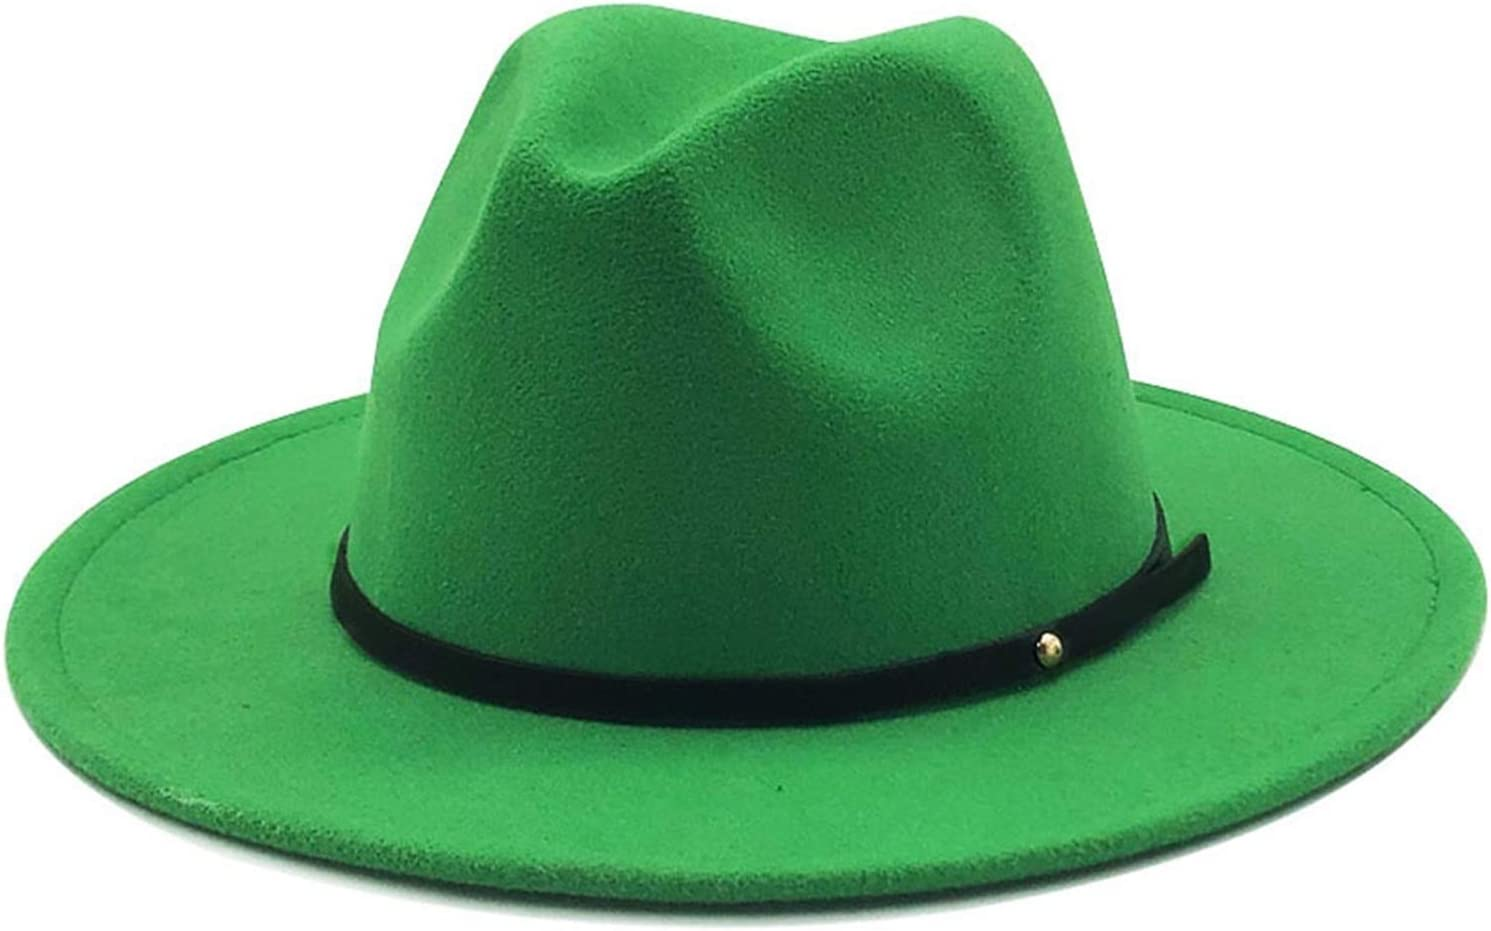 Tlwangl Hat Women Men Wool Vintage Fedora Hat with Wide Brim Gentleman Elegant Lady Winter Autumn Jazz Caps 60CM (Color : Grass Green, Size : 55 58CM)